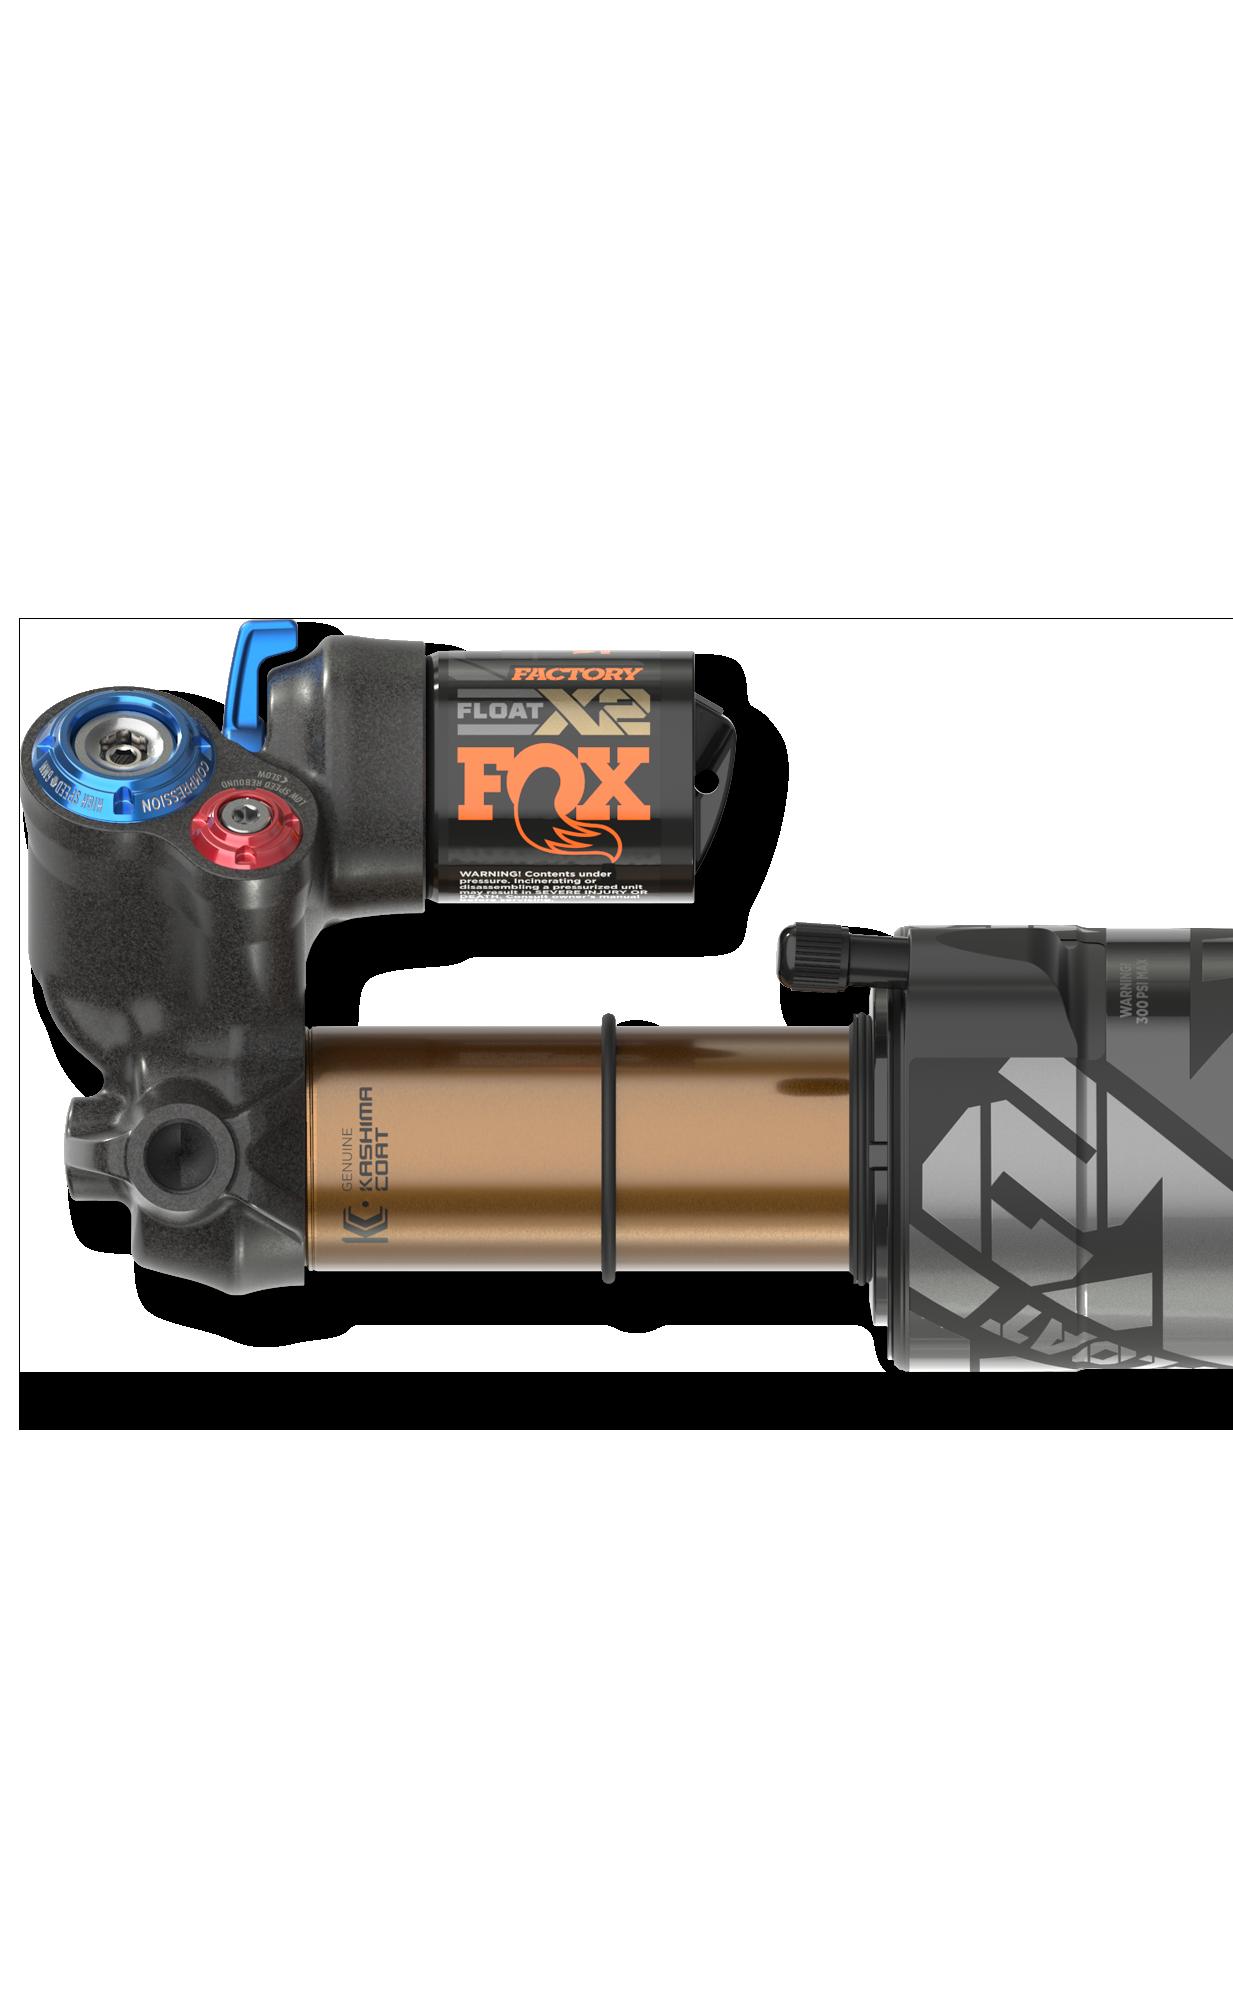 Explore Float X2 Bike Shocks Fox